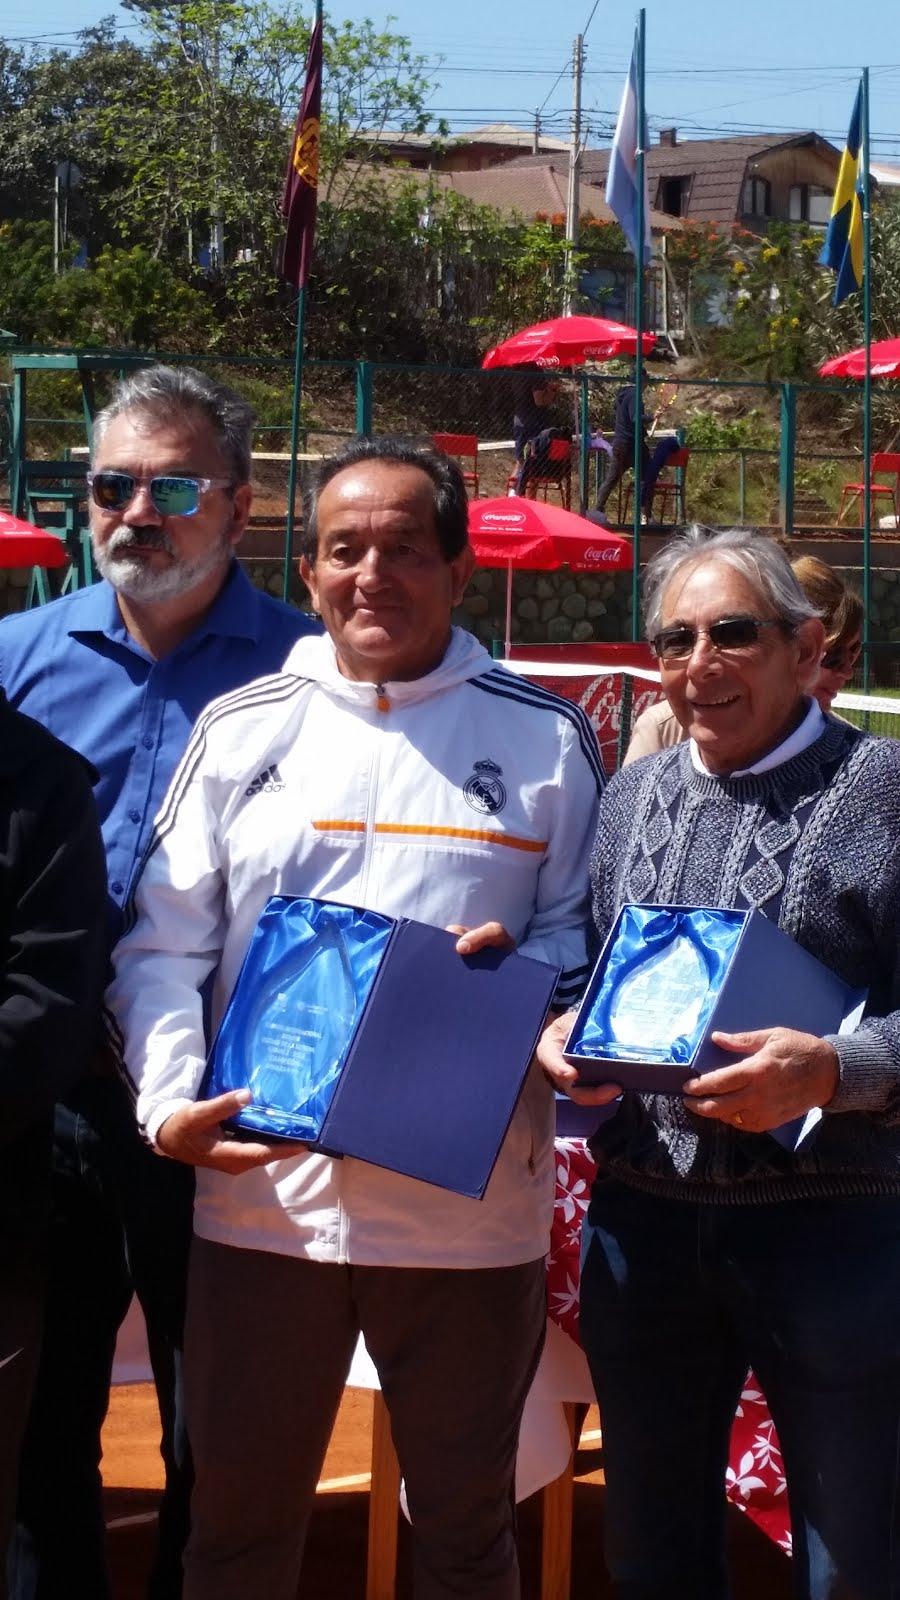 ITF SENIORS G2-LA SERENA - SALDO POSITIVO